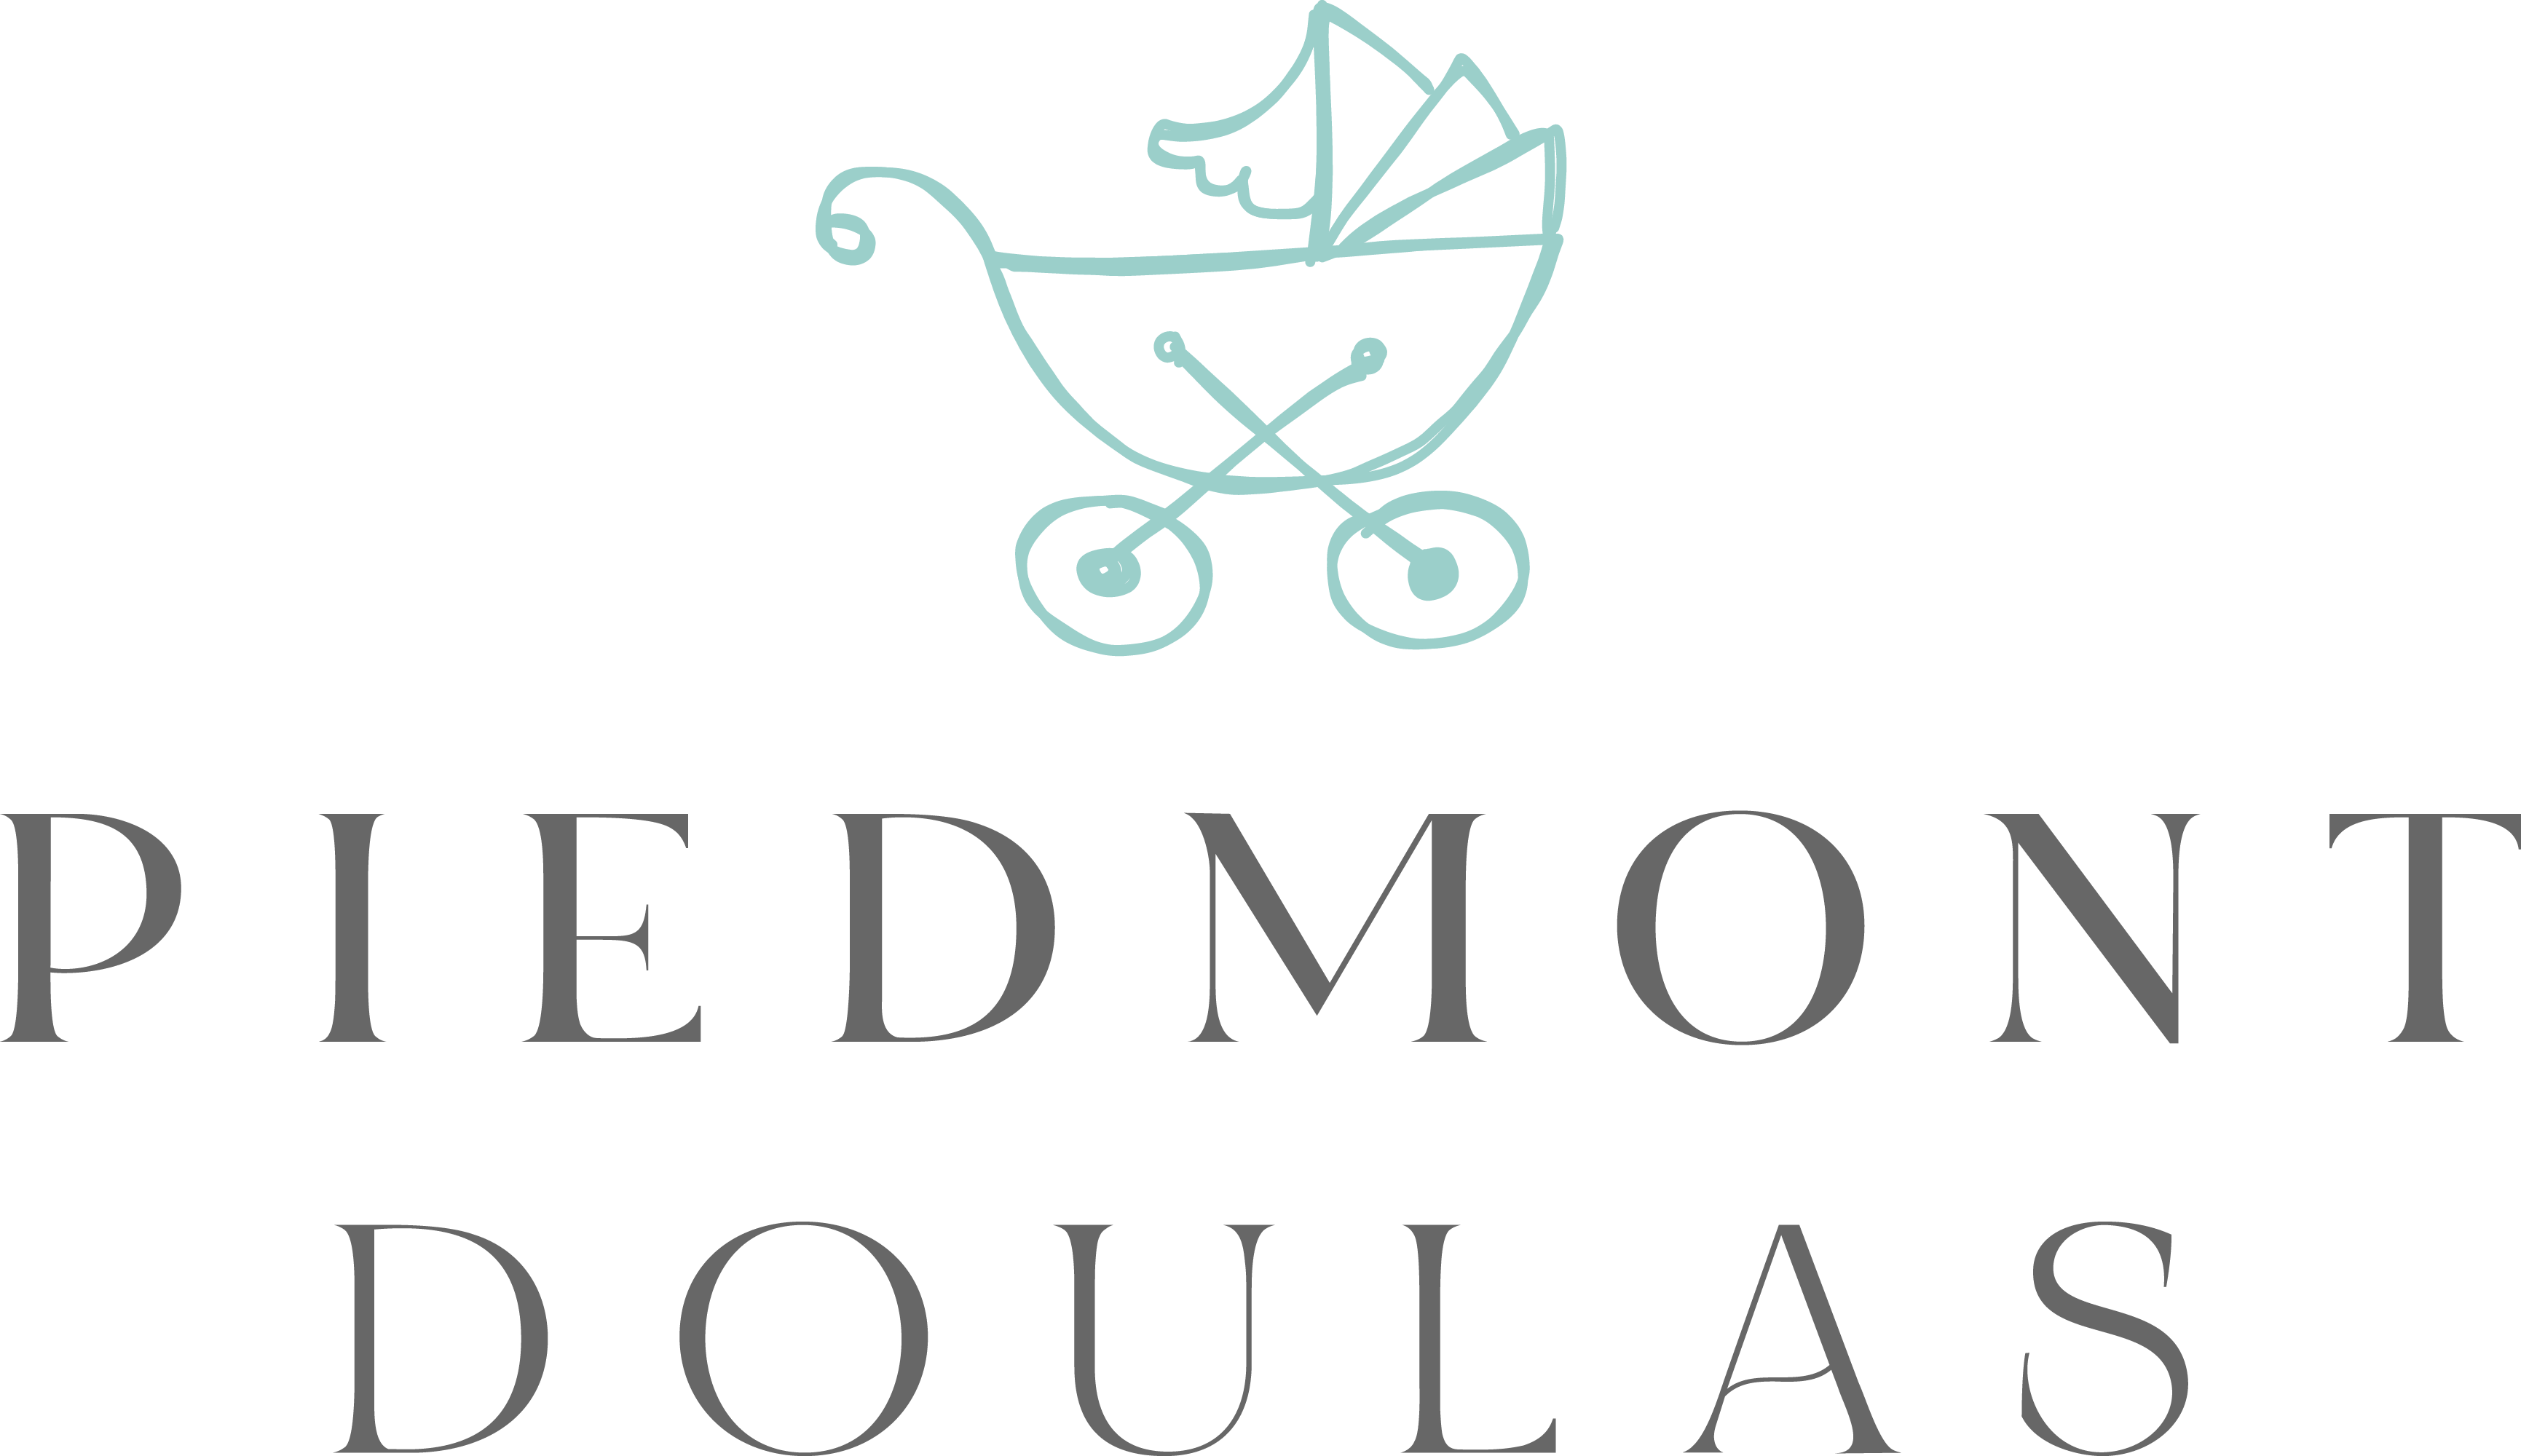 Piedmont Doulas